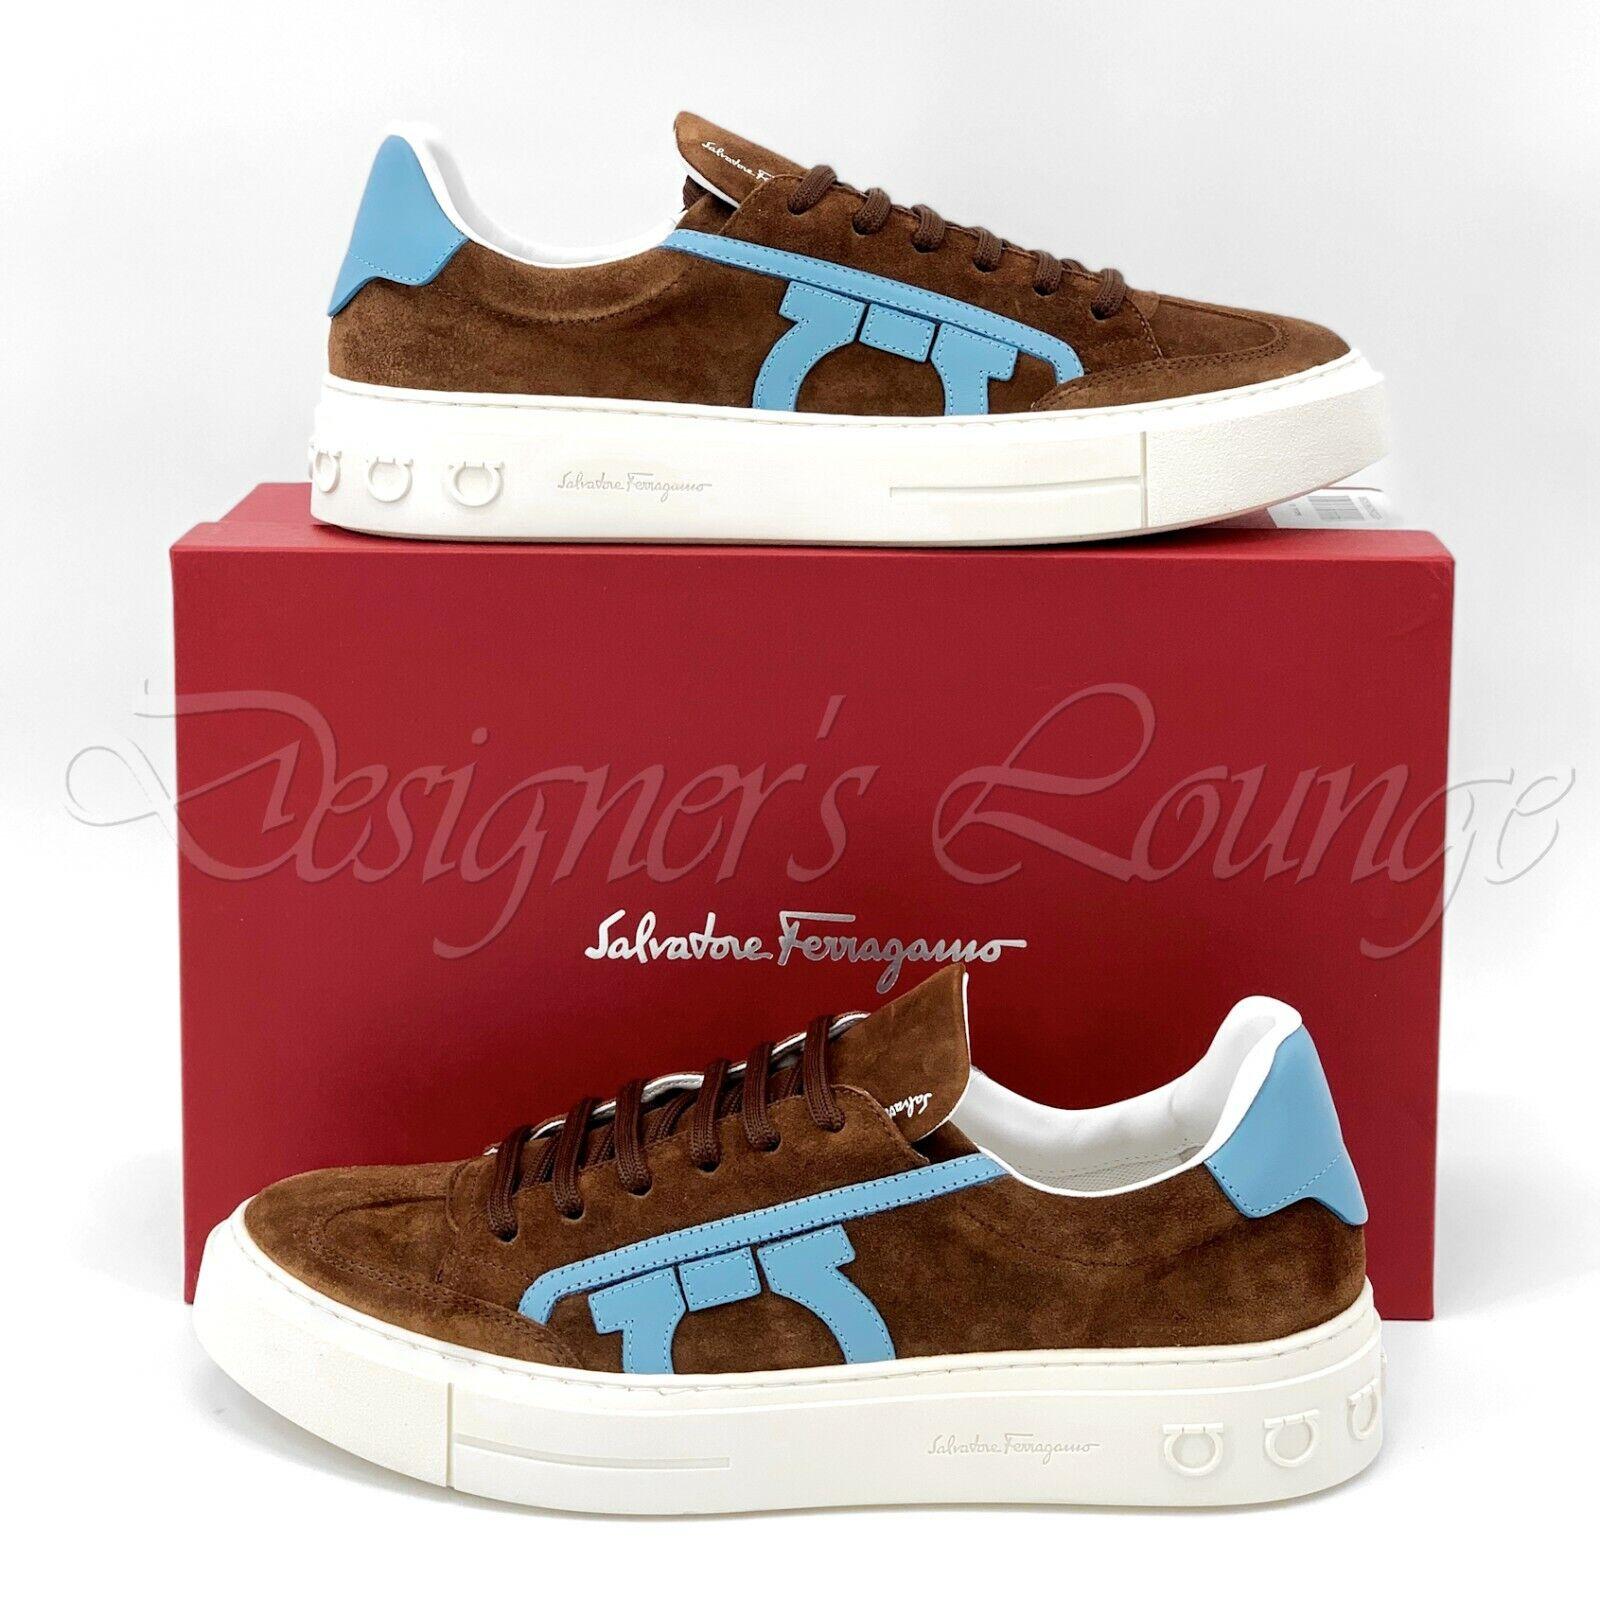 NEW SALVATORE FERRAGAMO Borg 2 Gancini US 9 Calf Suede Leather Sneakers